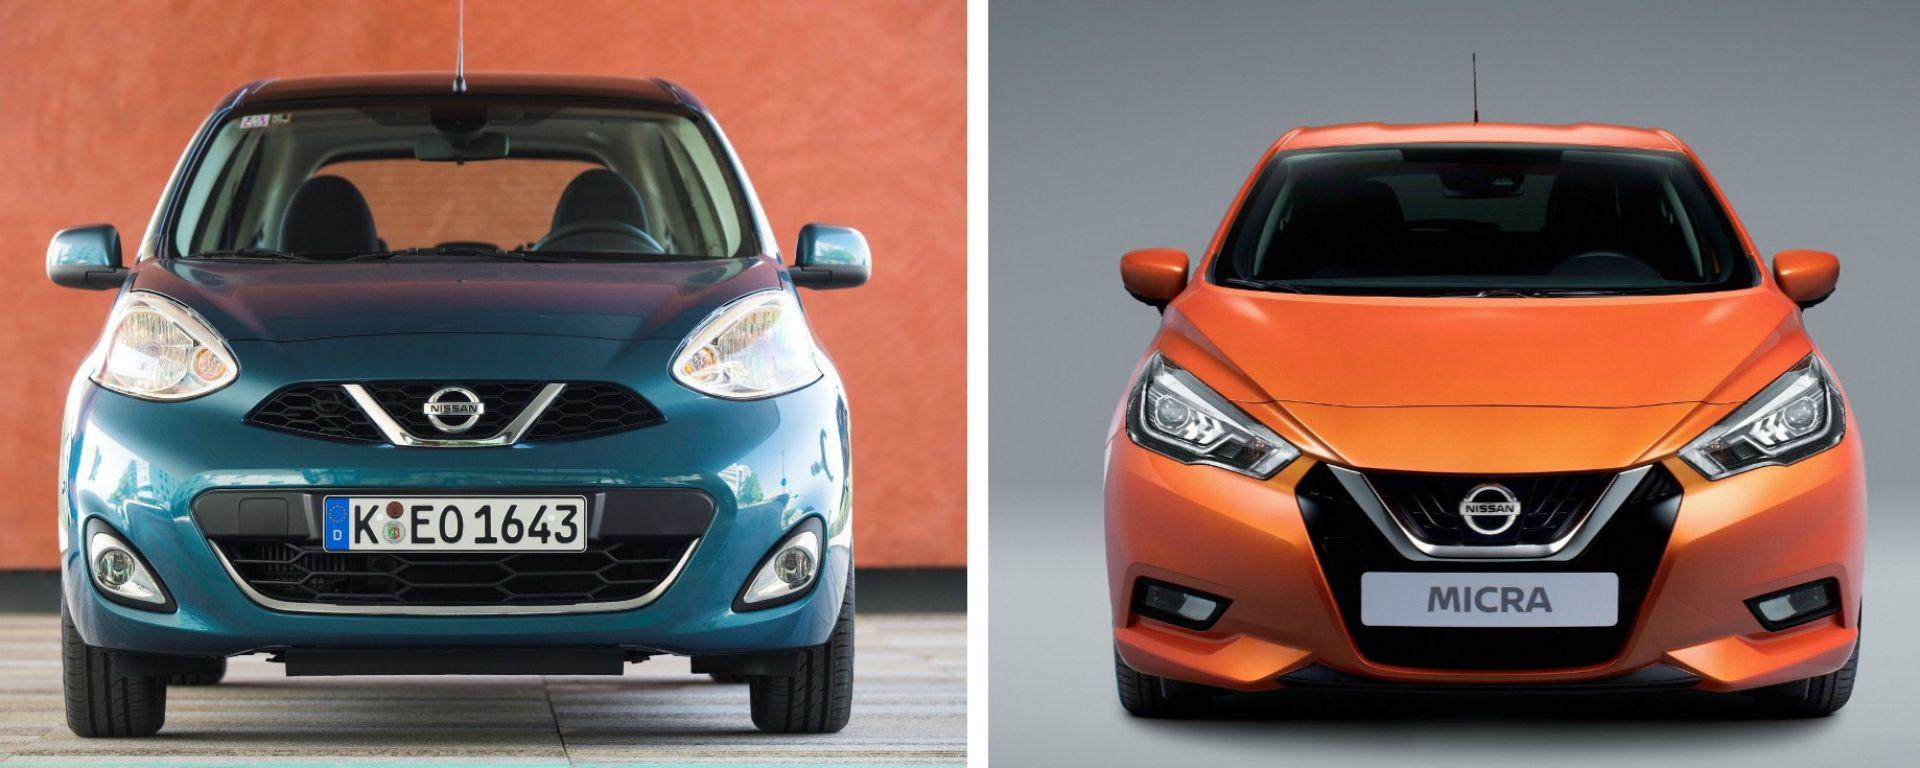 Nuova Nissan Micra vs Nissan Micra fine serie